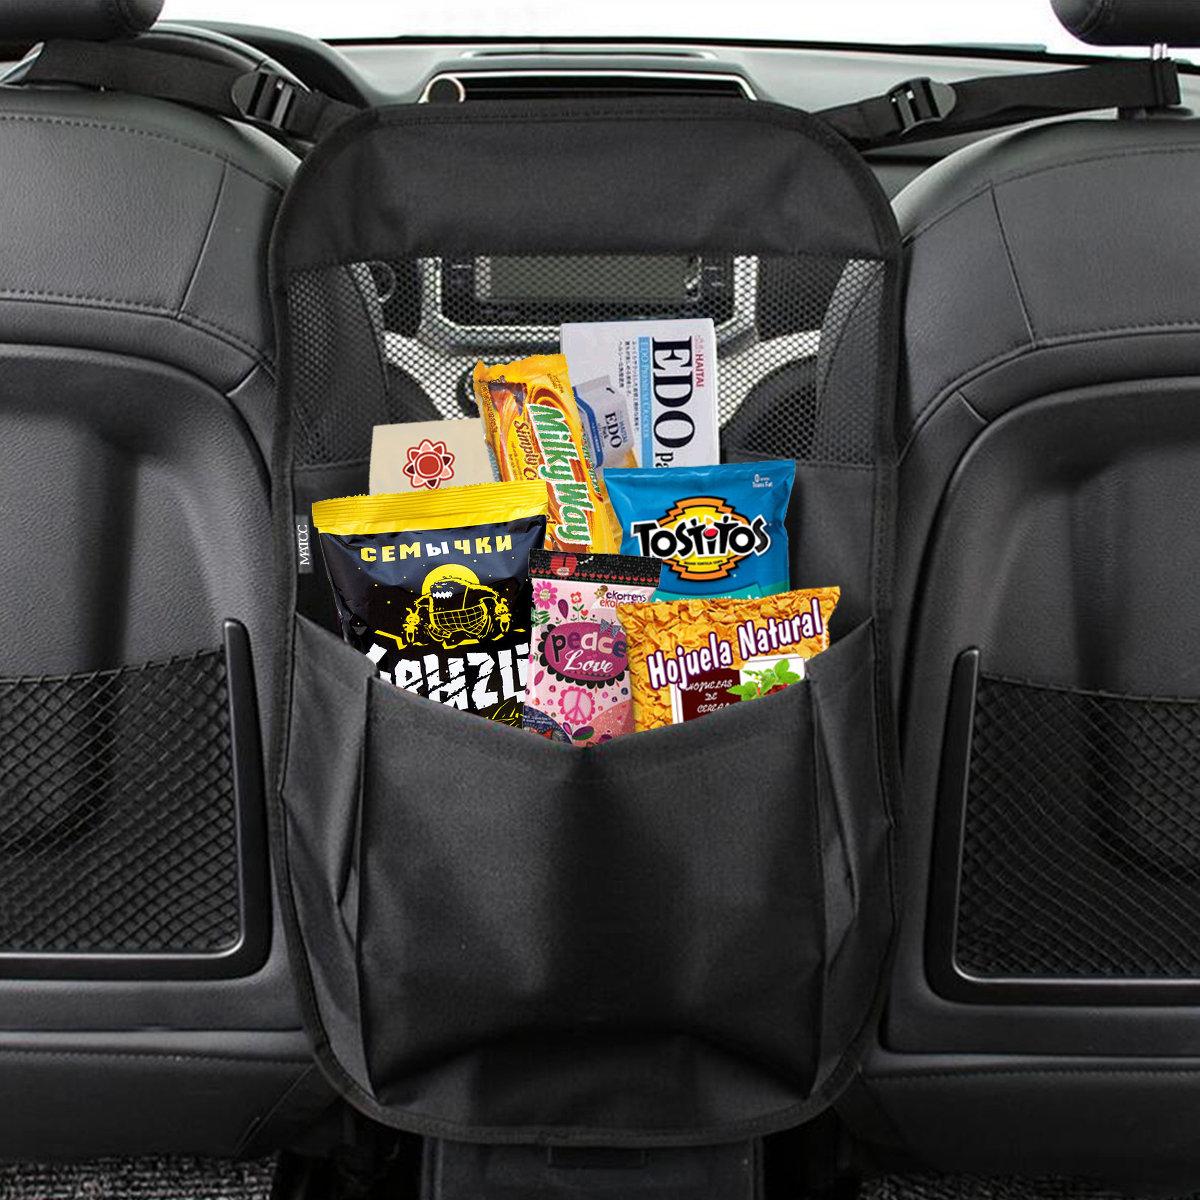 MATCC 55x38cm Car Partition Storage Bag Seat Central Storage Bag In-vehicle Storage Safety Barrier